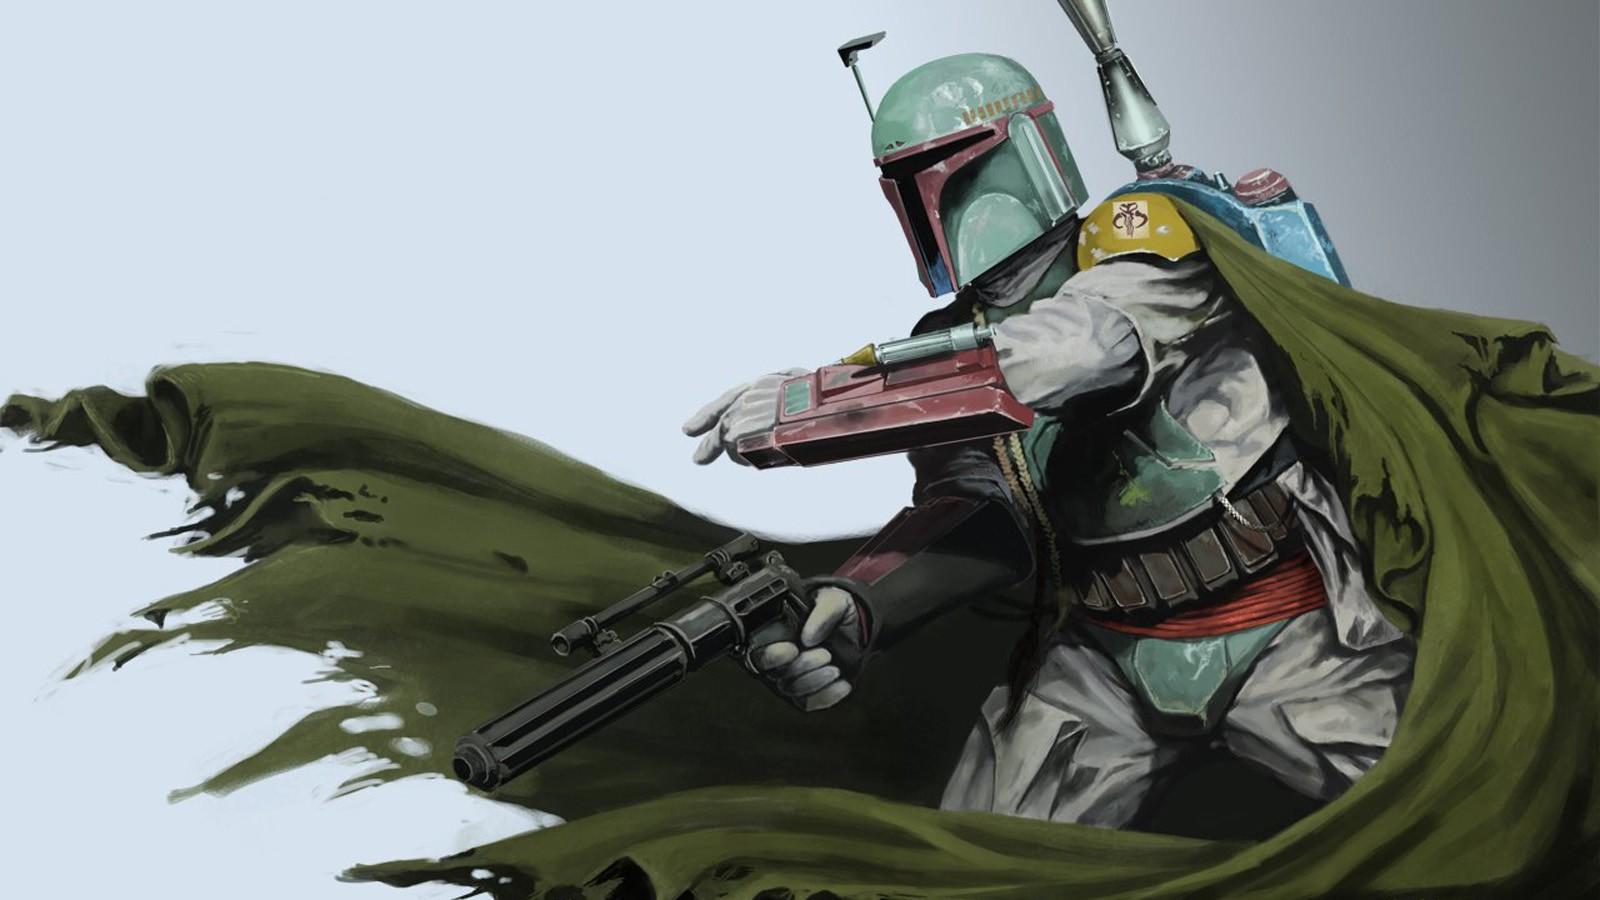 Wallpaper : Star Wars, soldier, Boba Fett, comics, Person ...